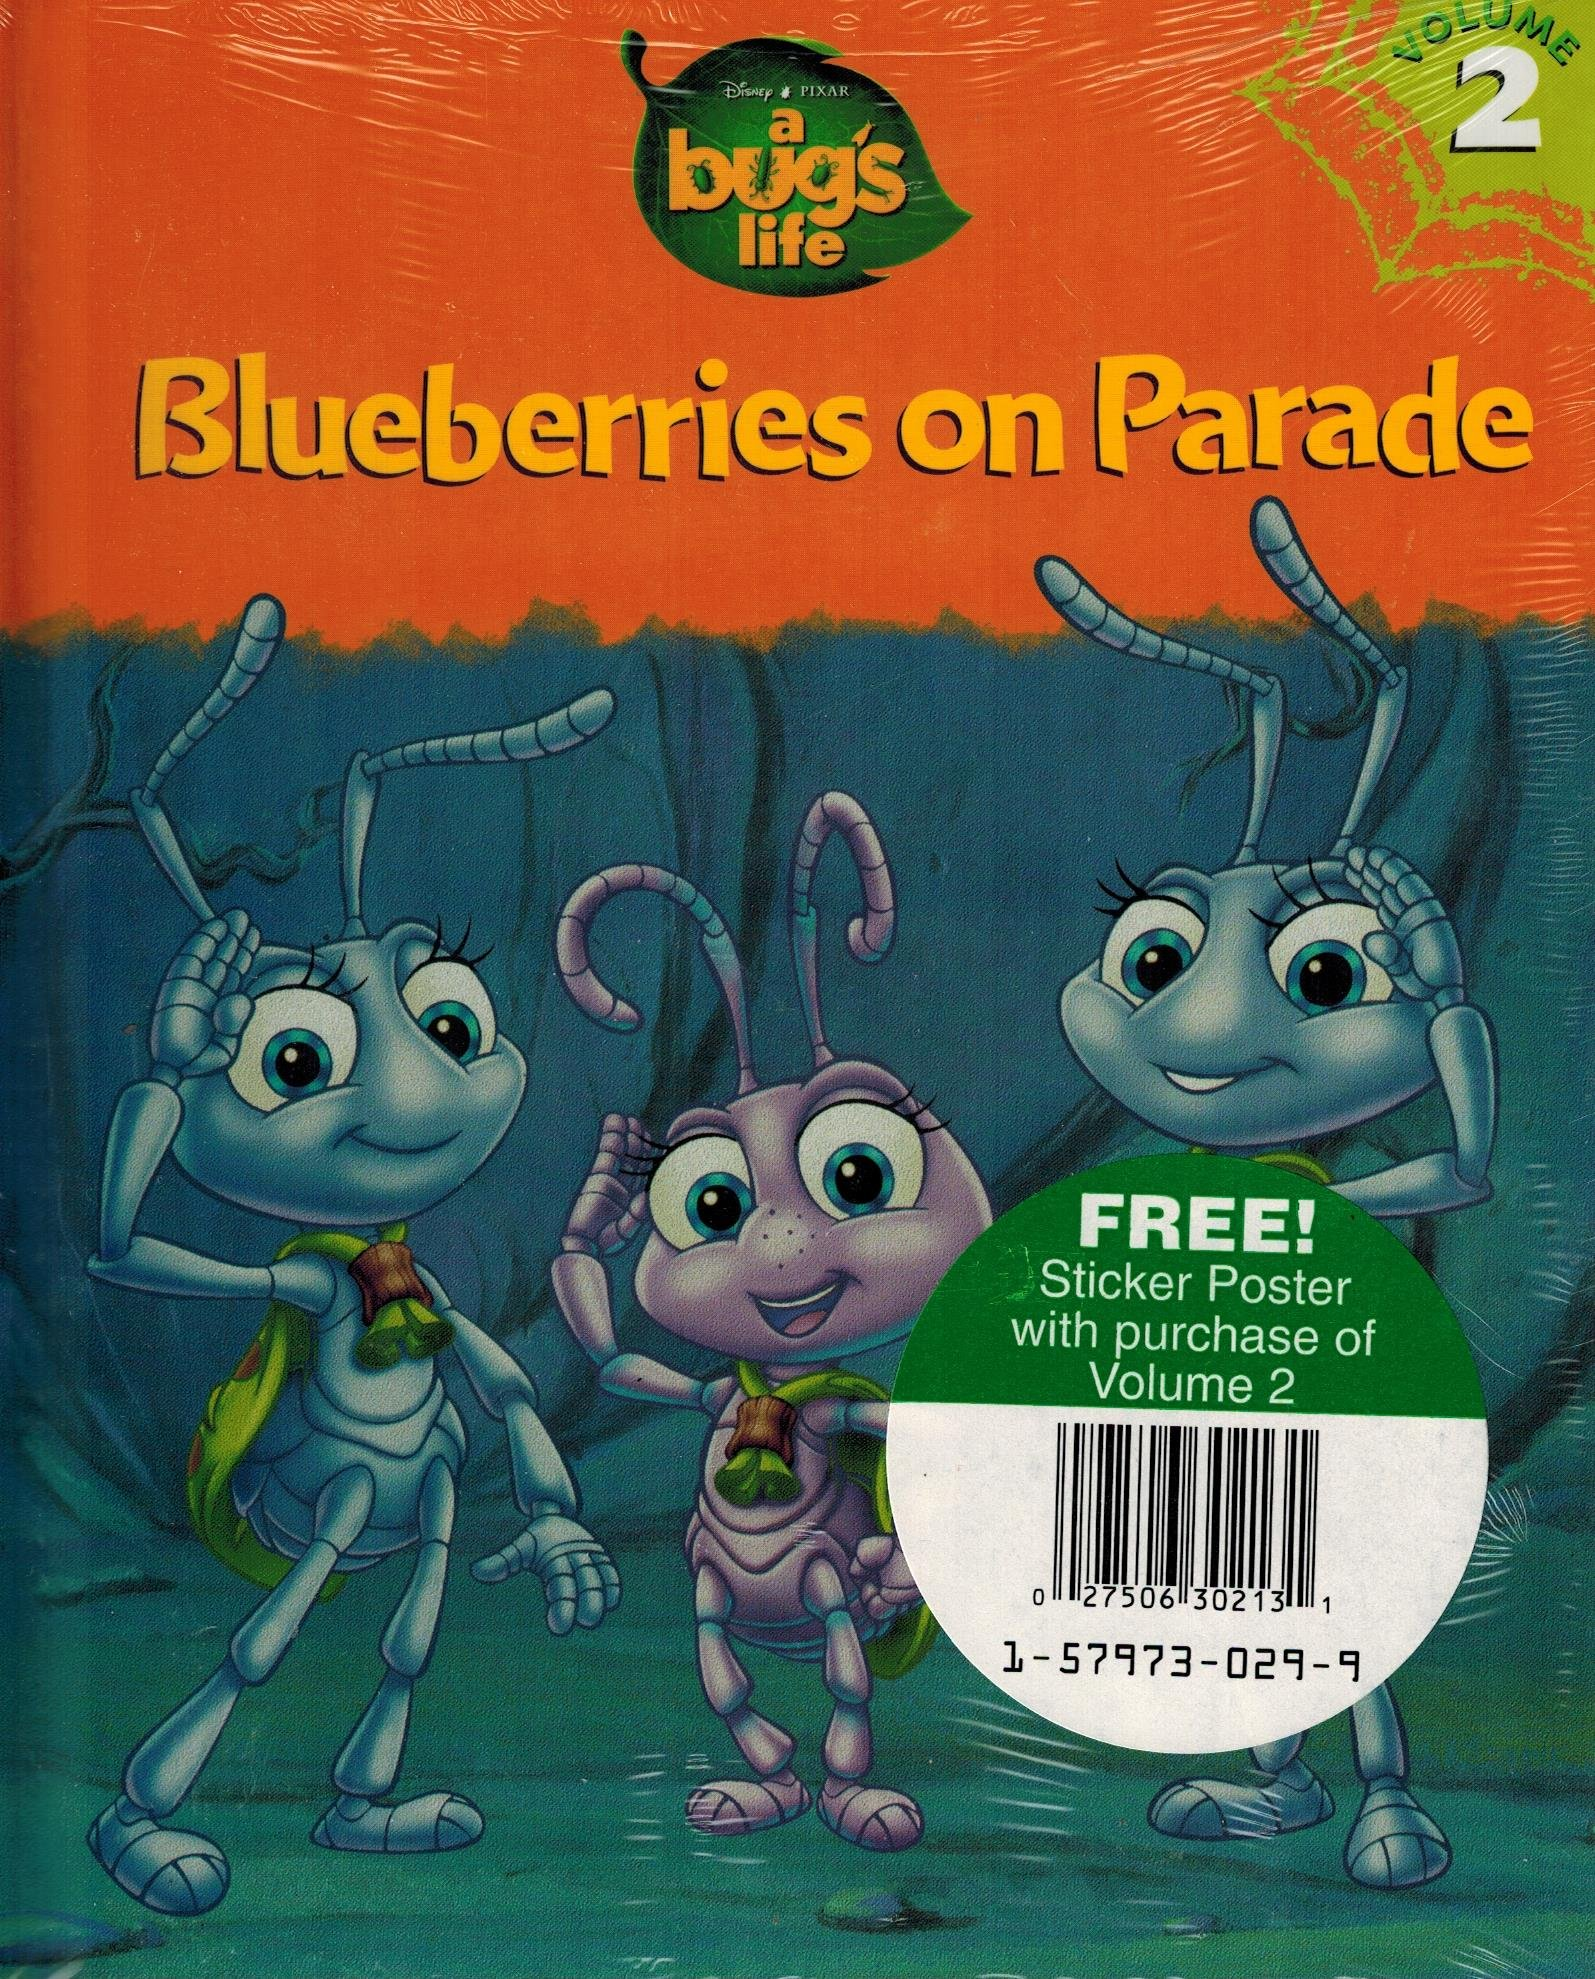 Blueberries On Parade A Bugs Life Volume 2 Emily Hutta Victoria Saxon 9781579730291 Amazon Com Books